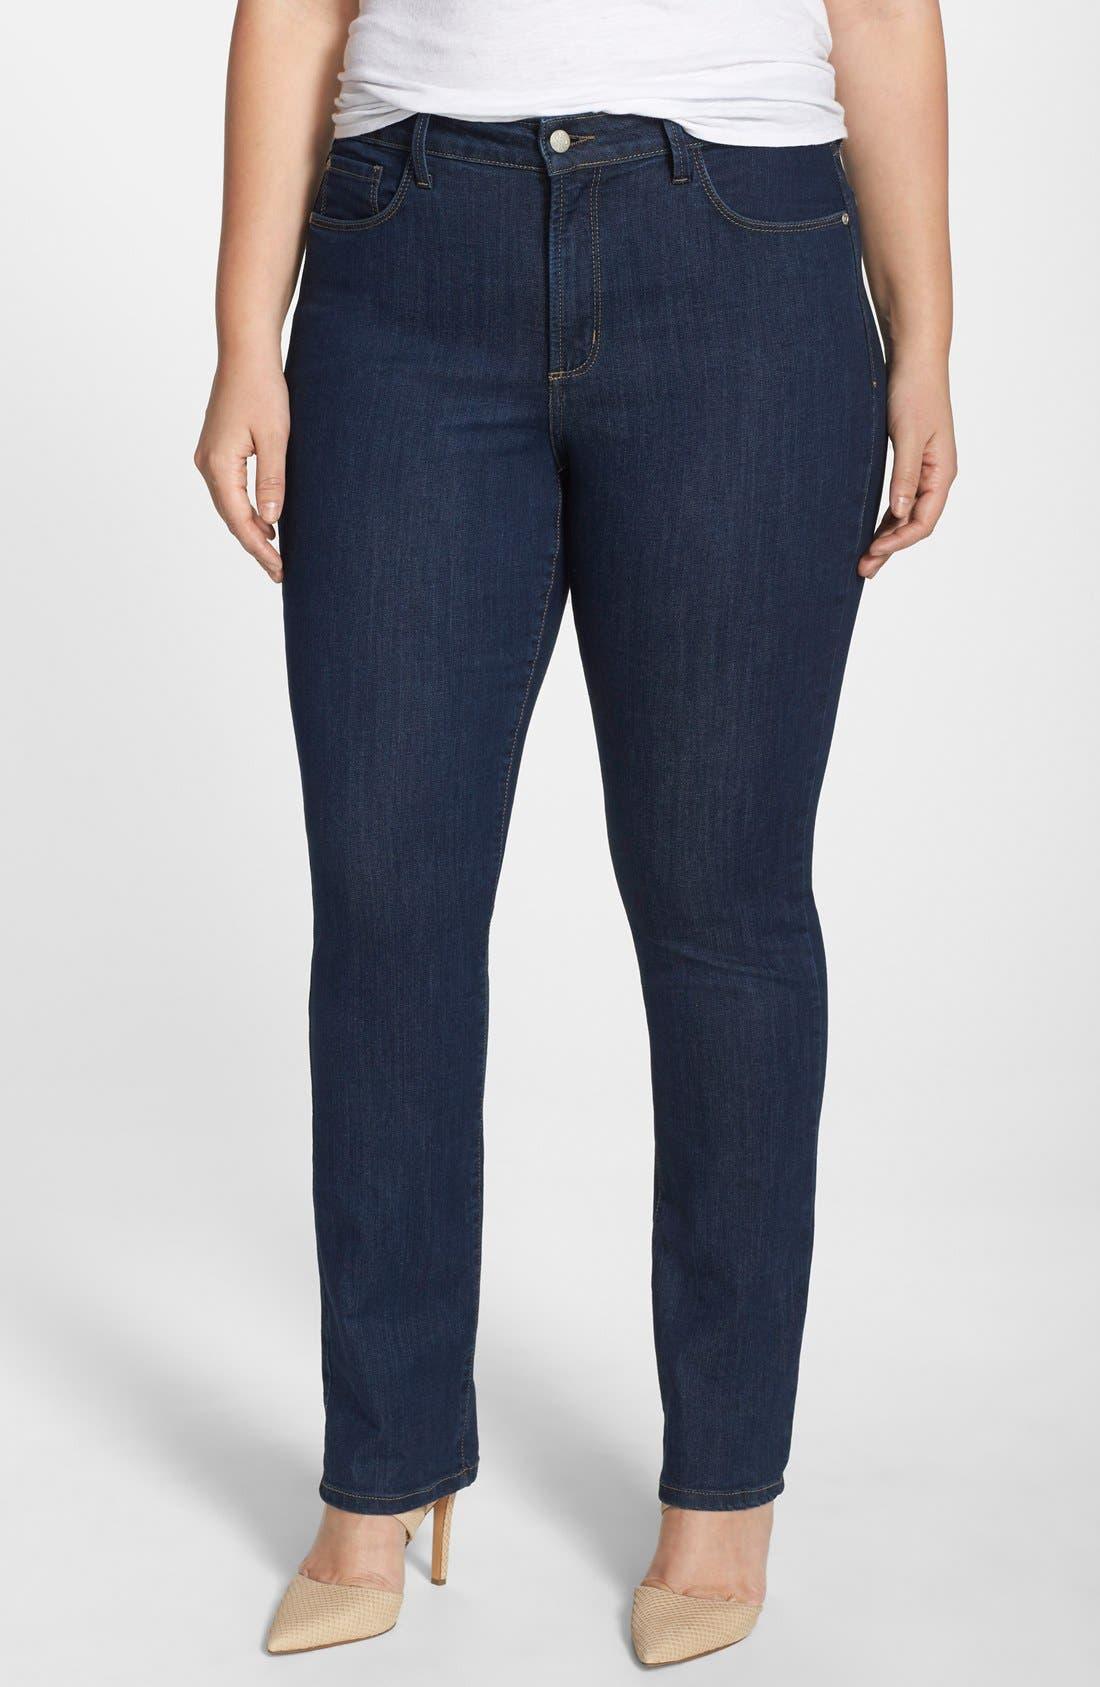 Main Image - NYDJ 'Samantha' Stretch Slim Straight Leg Jeans (Everett) (Plus Size)